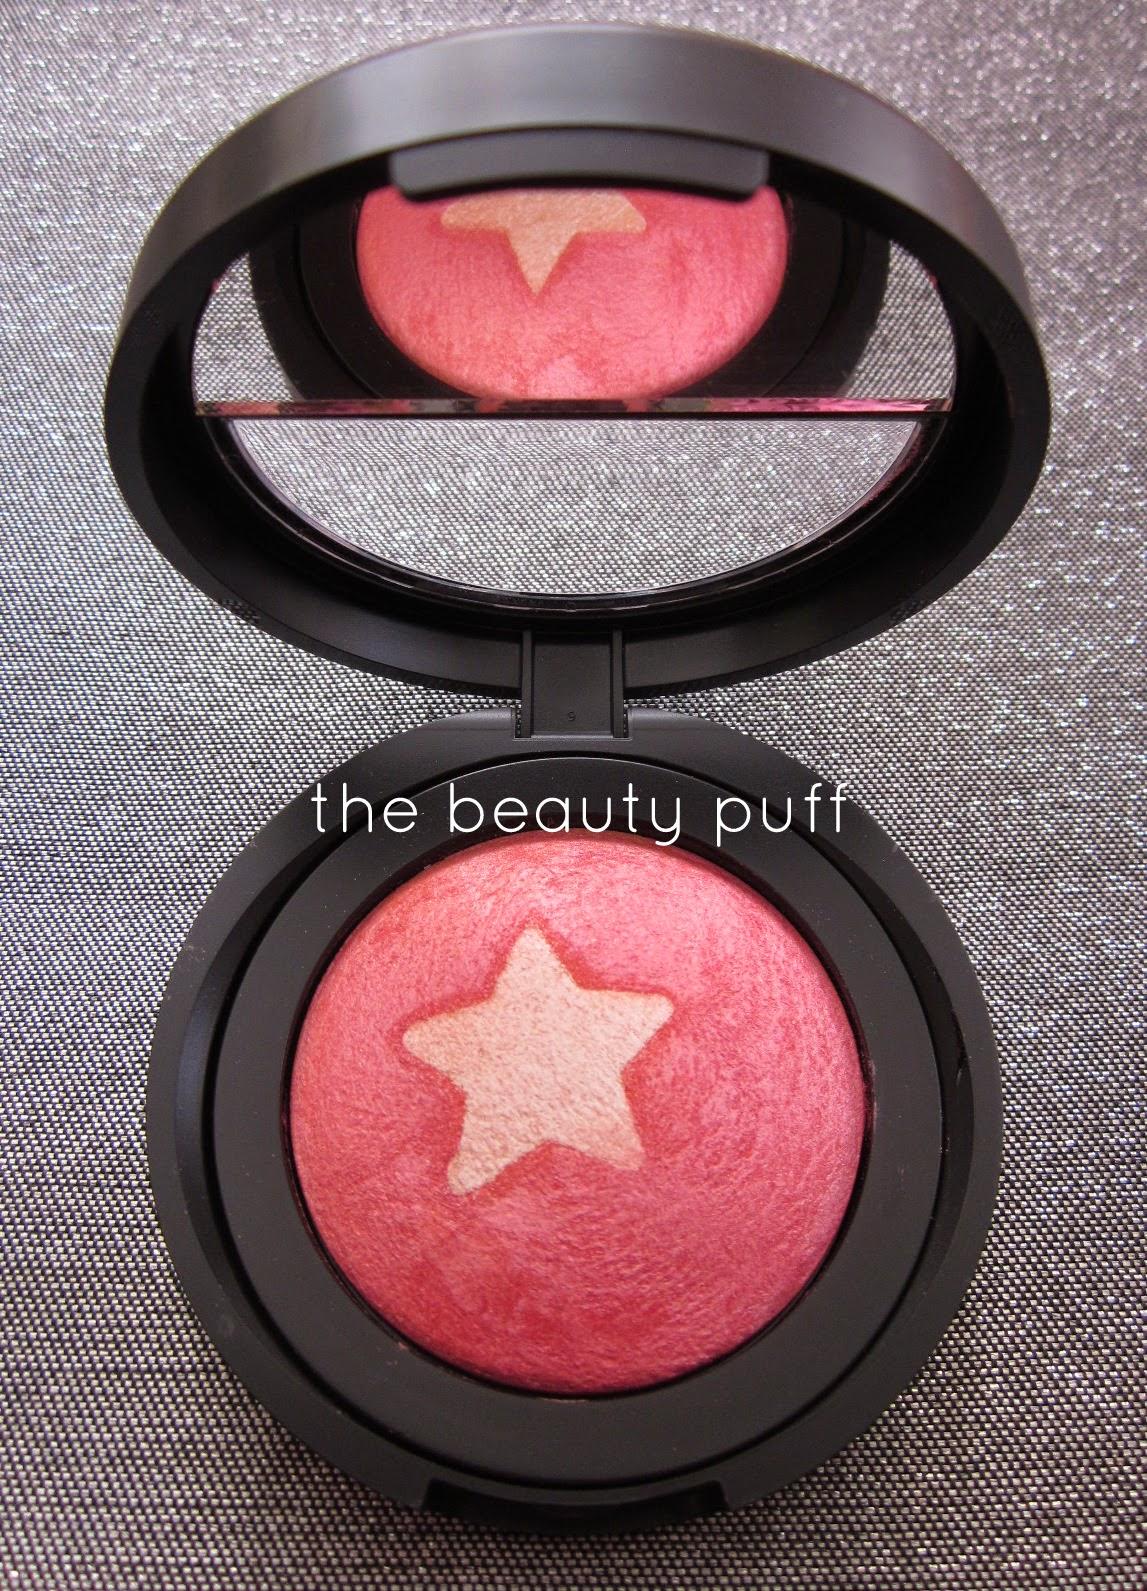 laura geller blush n highlight rose starlight - the beauty puff